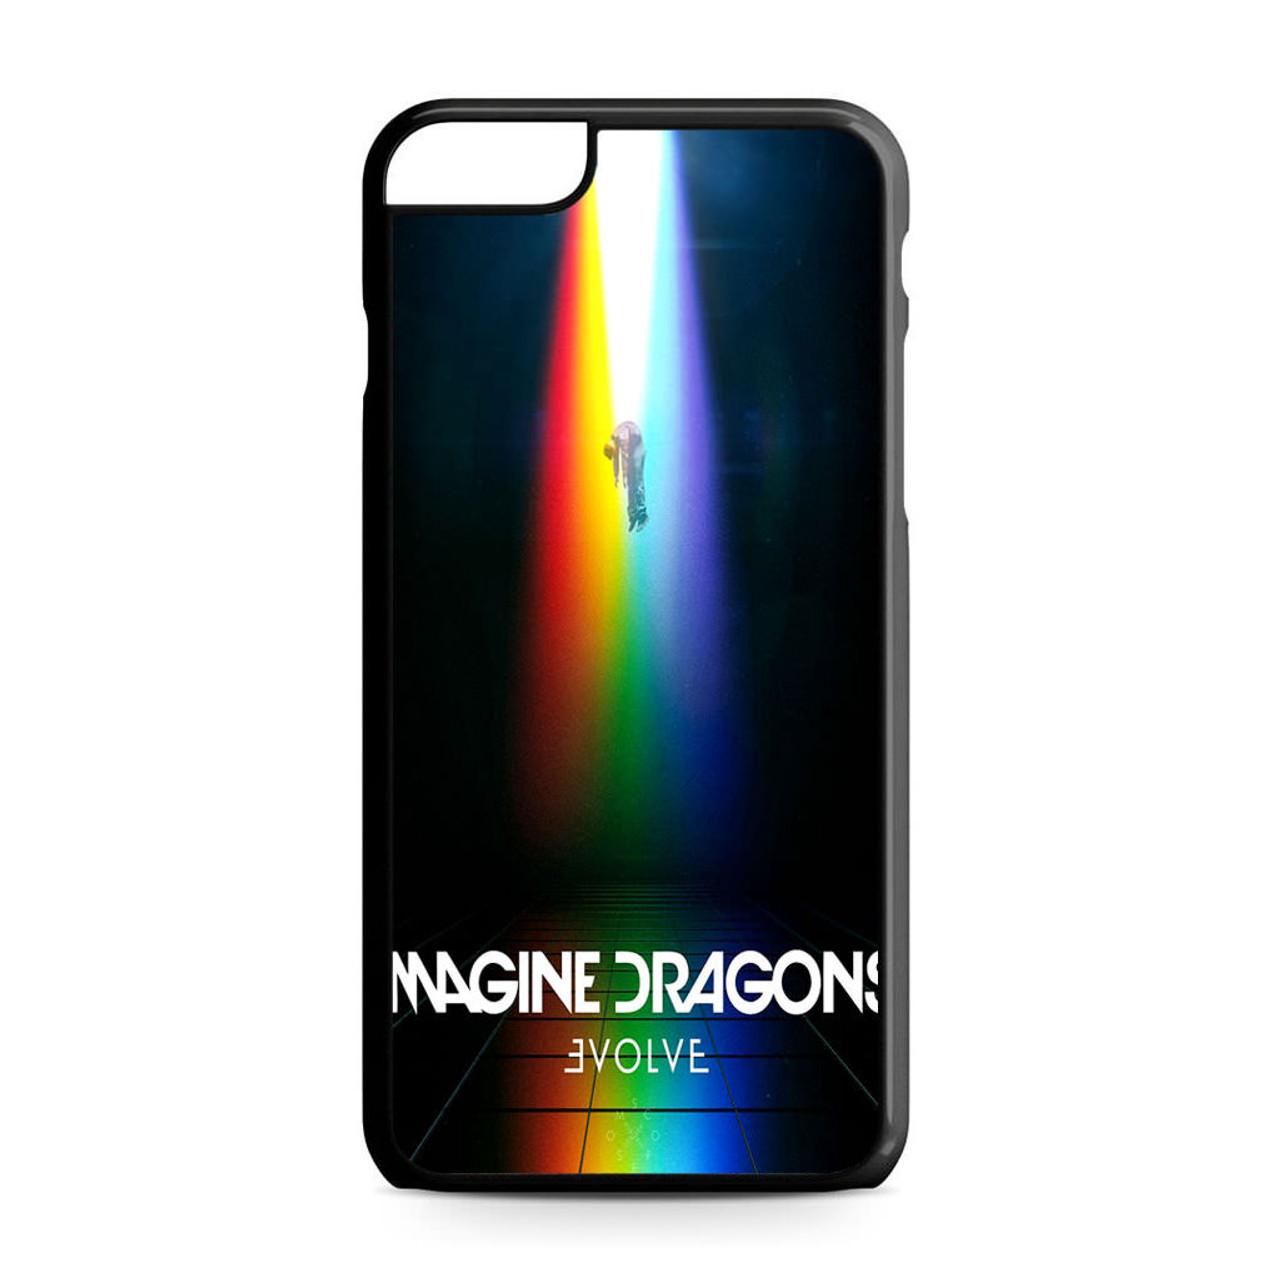 sale retailer 62d99 667f5 Imagine Dragons Evolve iPhone 6 Plus/6S Plus Case